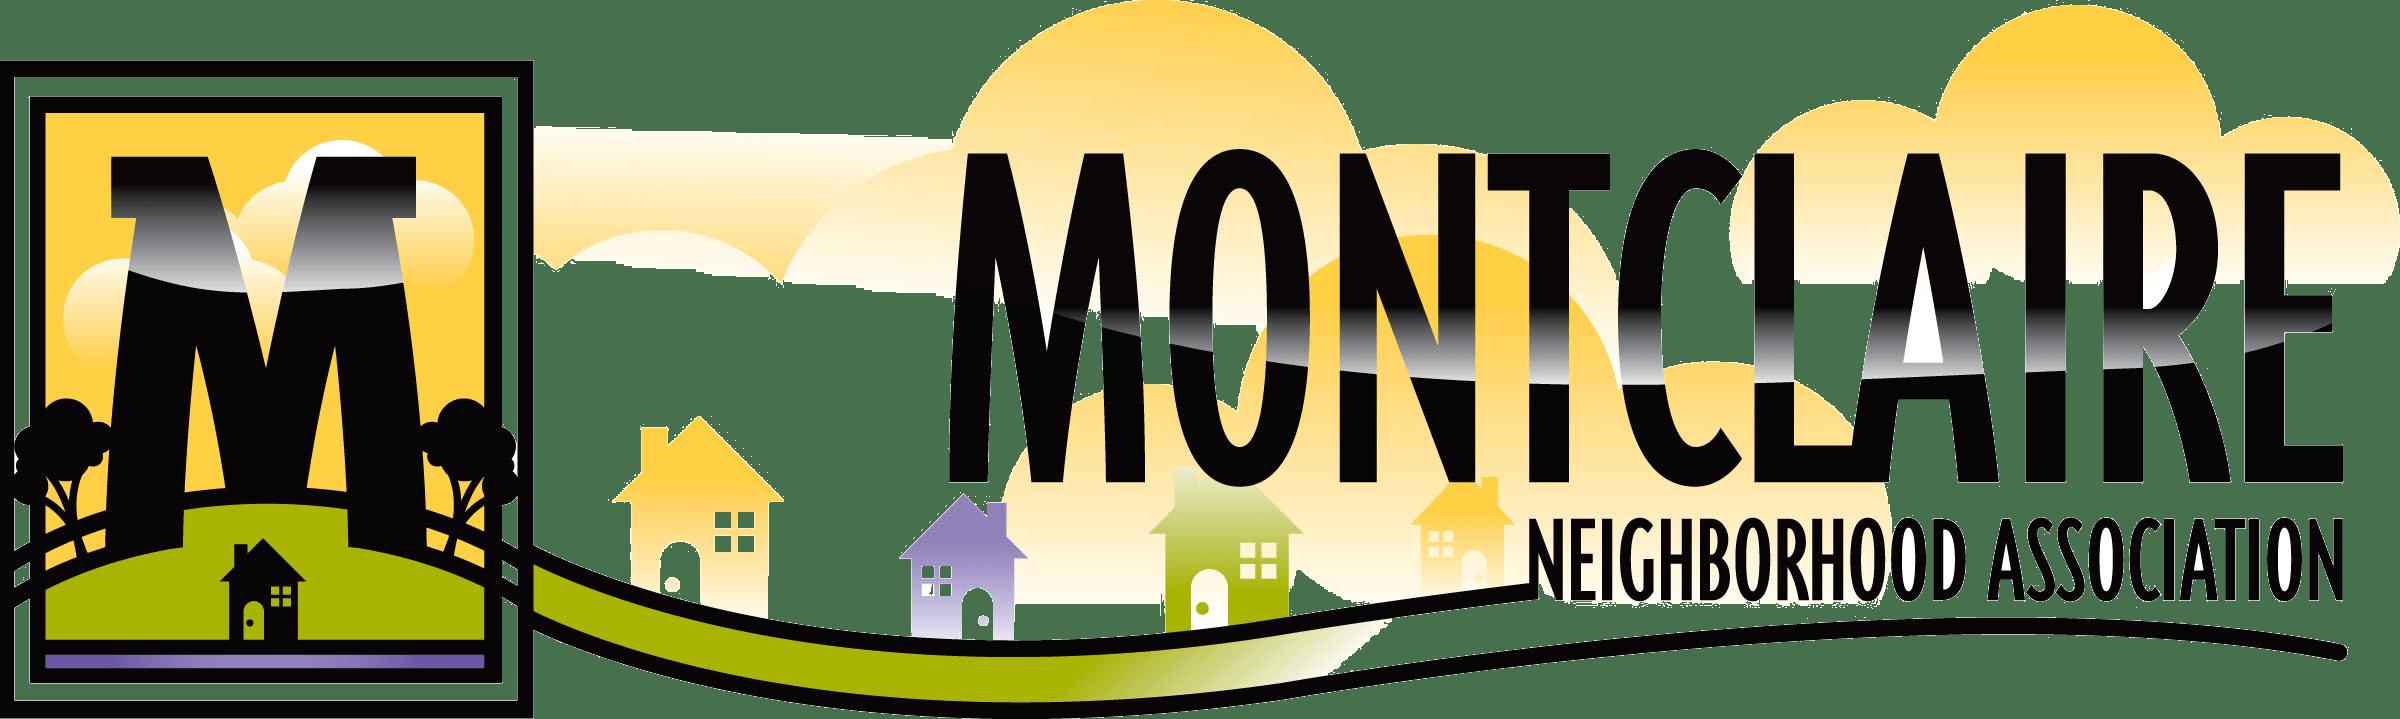 Montclaire association about us. Fundraiser clipart neighborhood meeting